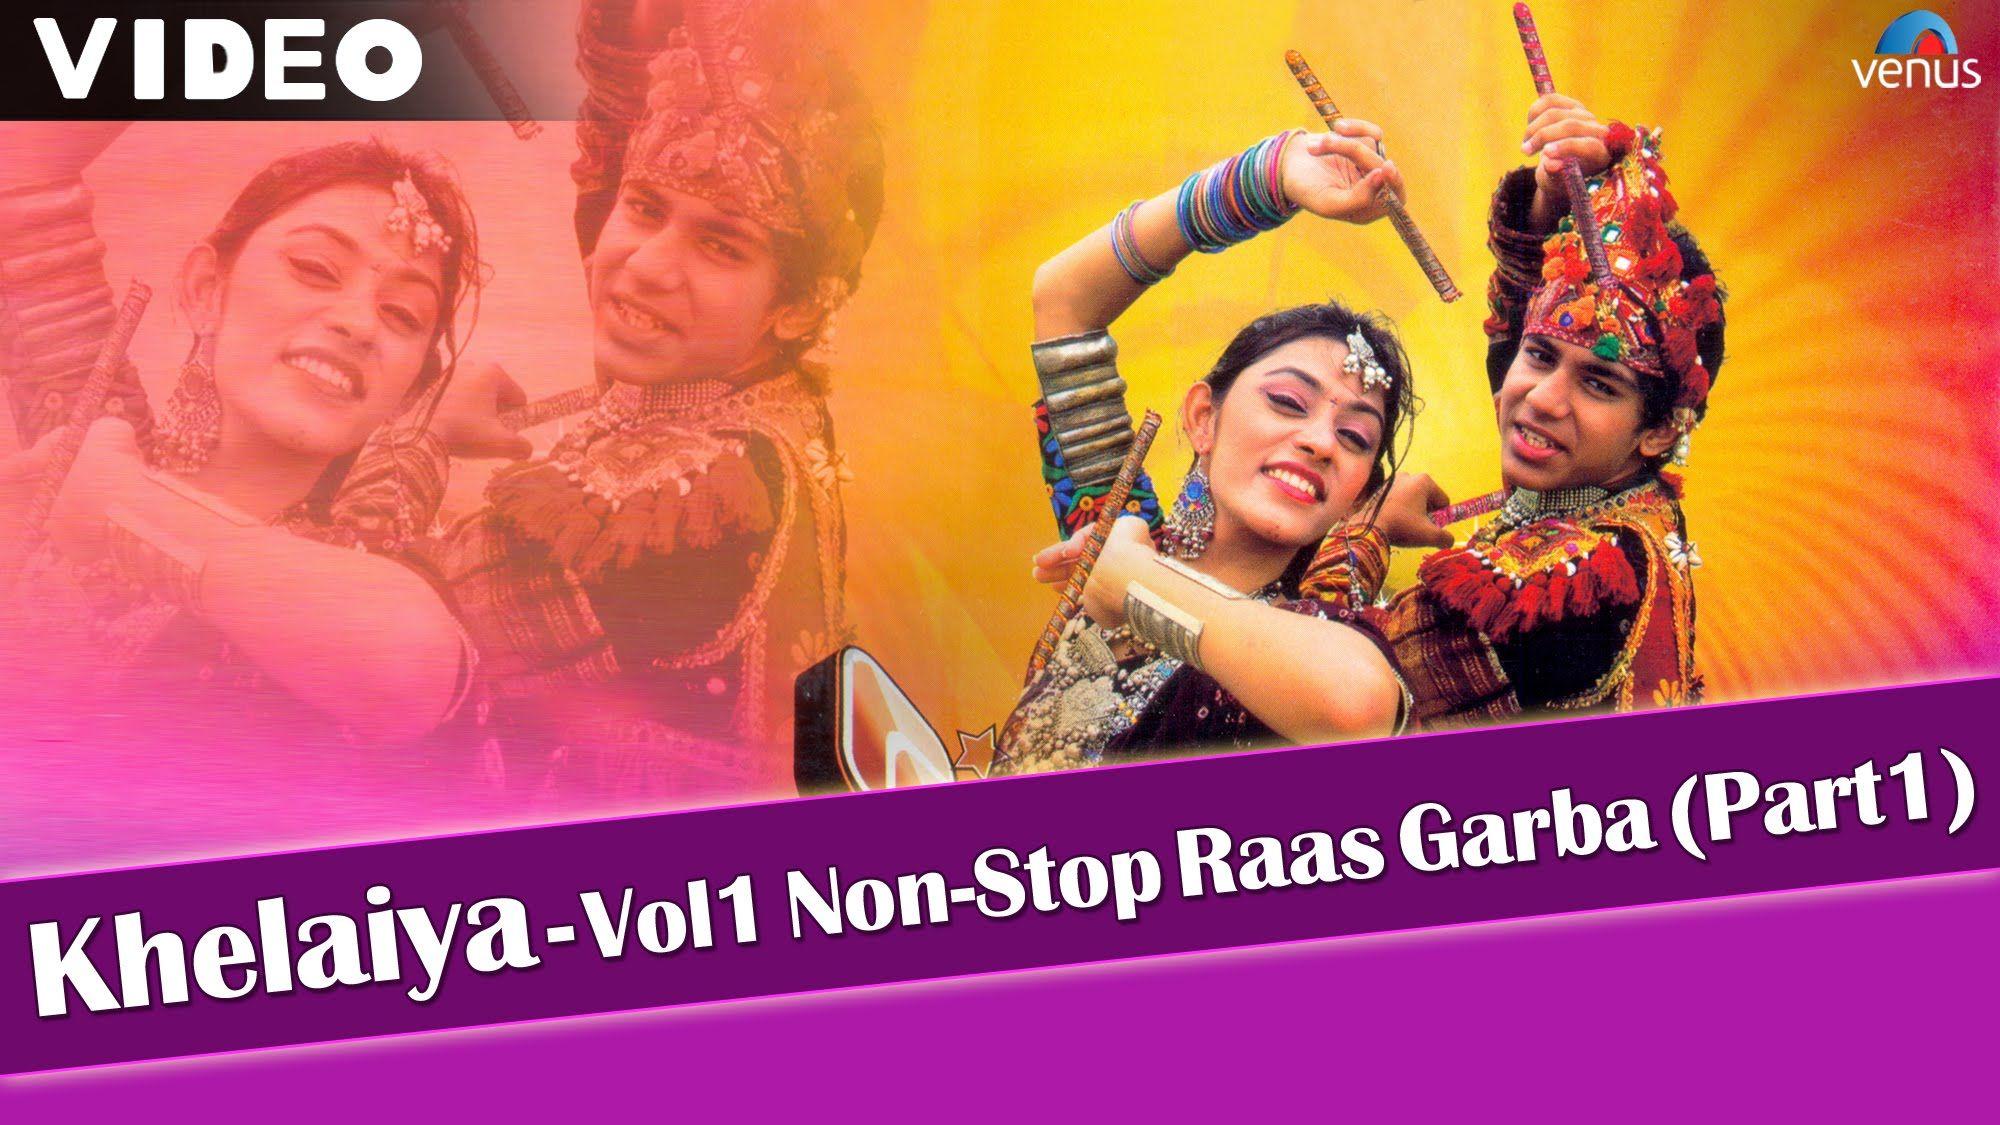 Khelaiya Vol 1 Non Stop Raas Garba Part 1 Latest Dandiya Songs Vid Garba Songs Navratri Songs Songs